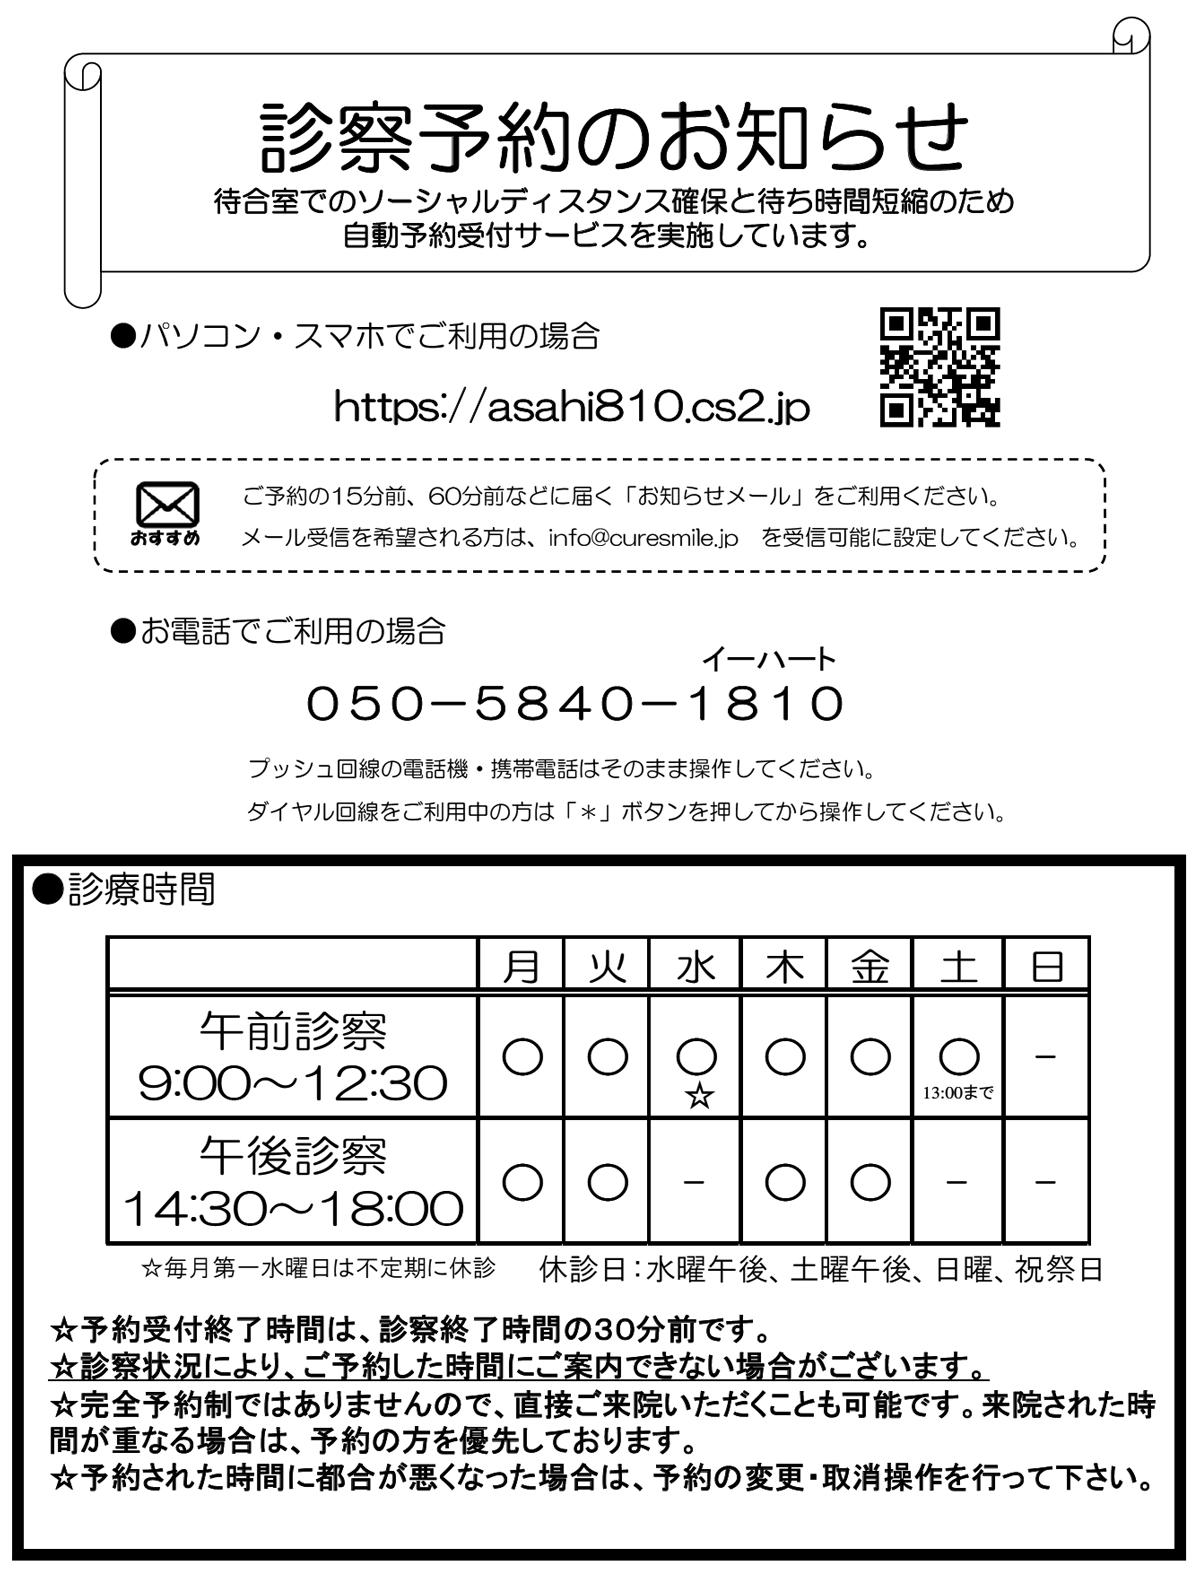 旭ヶ丘ハート内科予約方法1